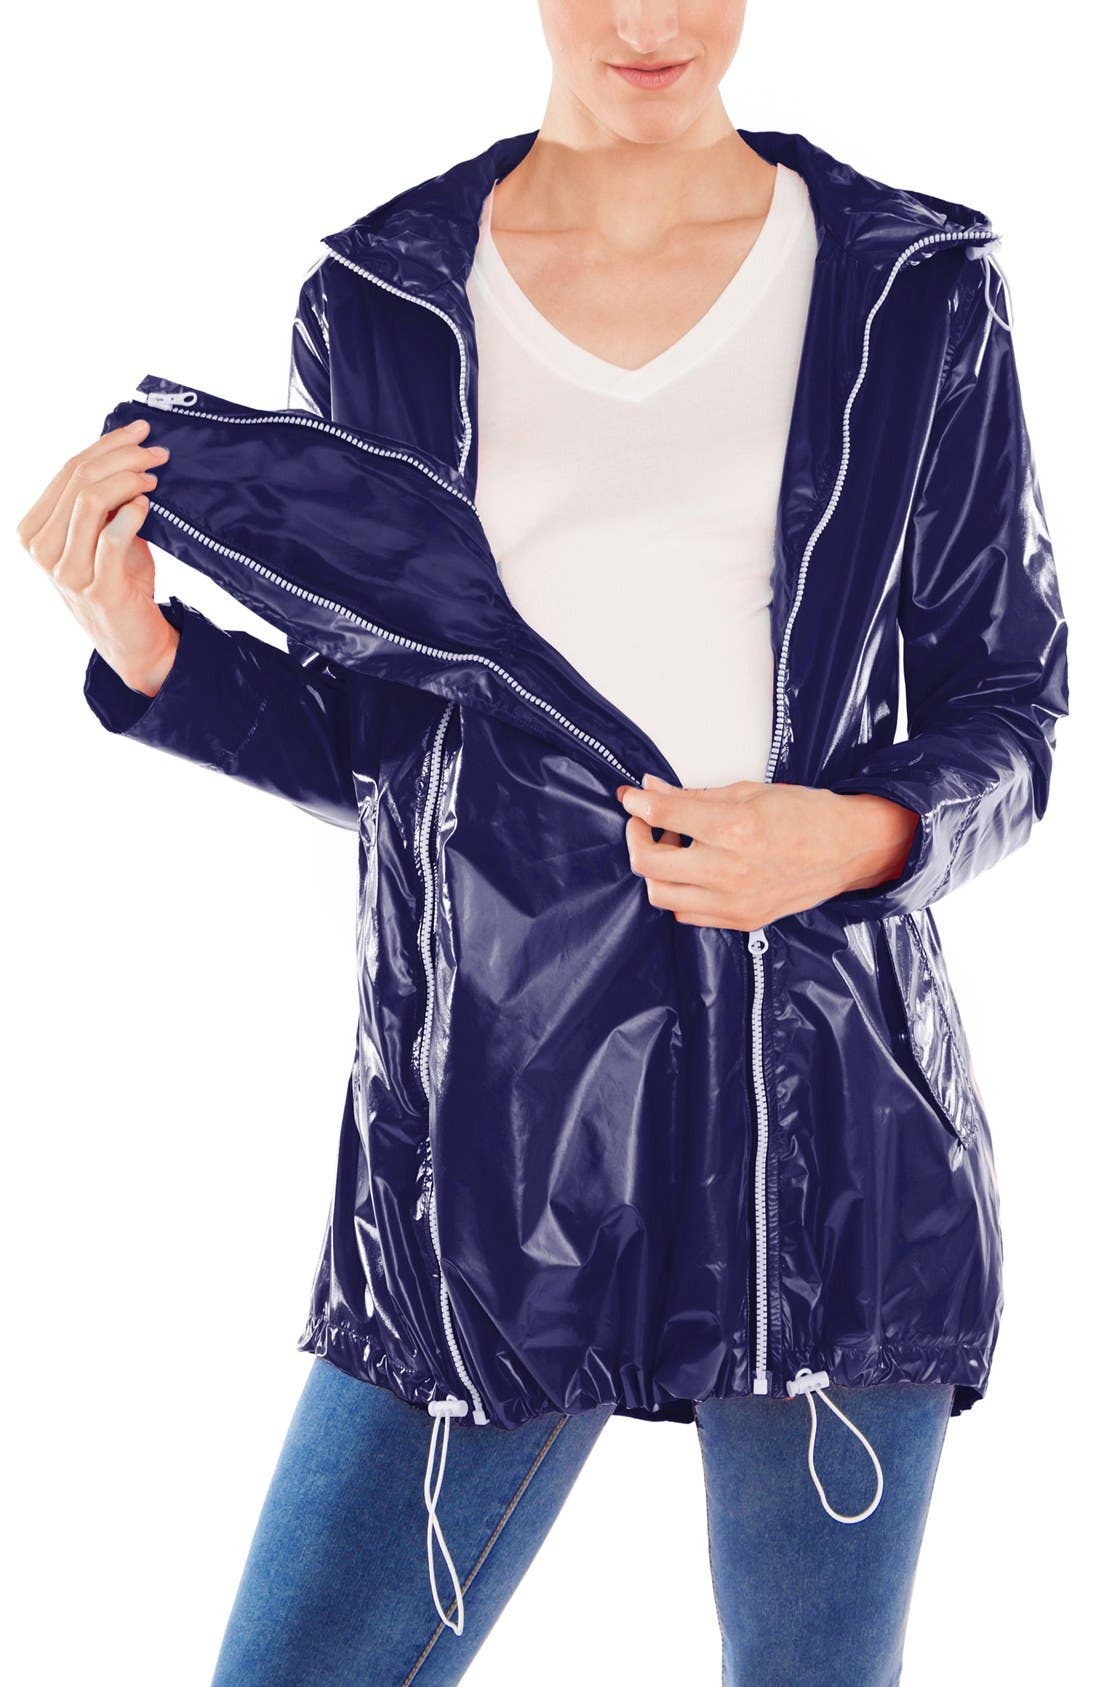 Waterproof Convertible 3-in-1 Maternity Raincoat,                             Alternate thumbnail 10, color,                             BRIGHT NAVY